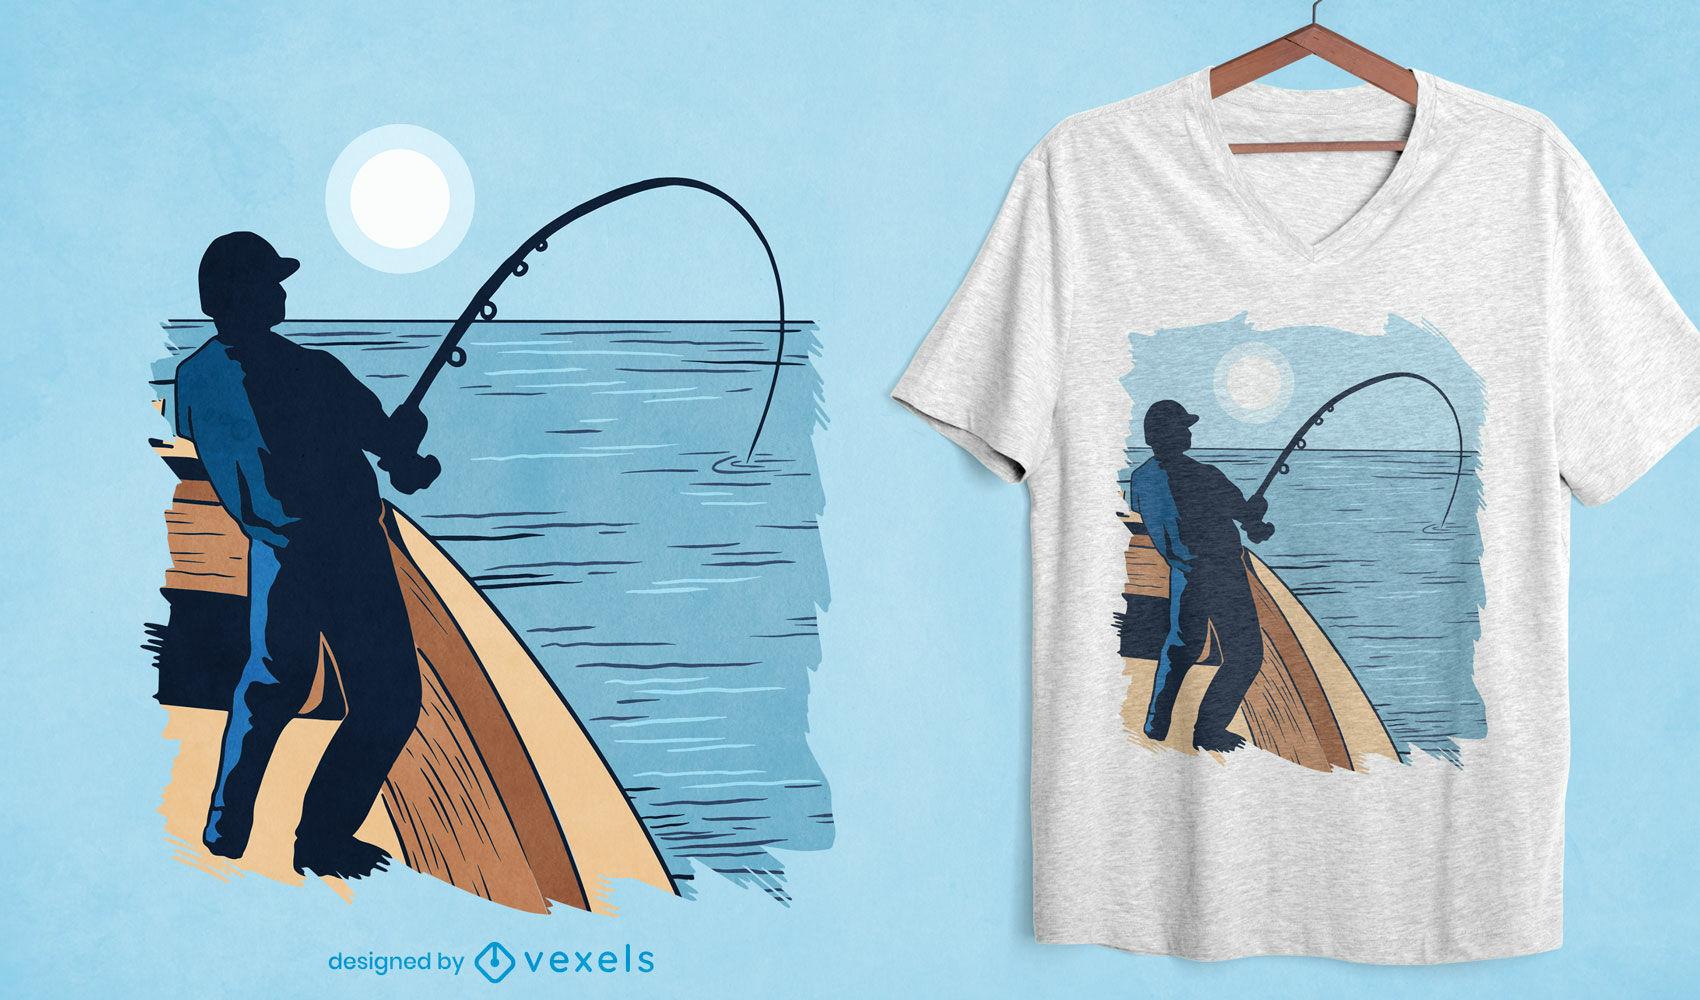 Deep sea fishing t-shirt design